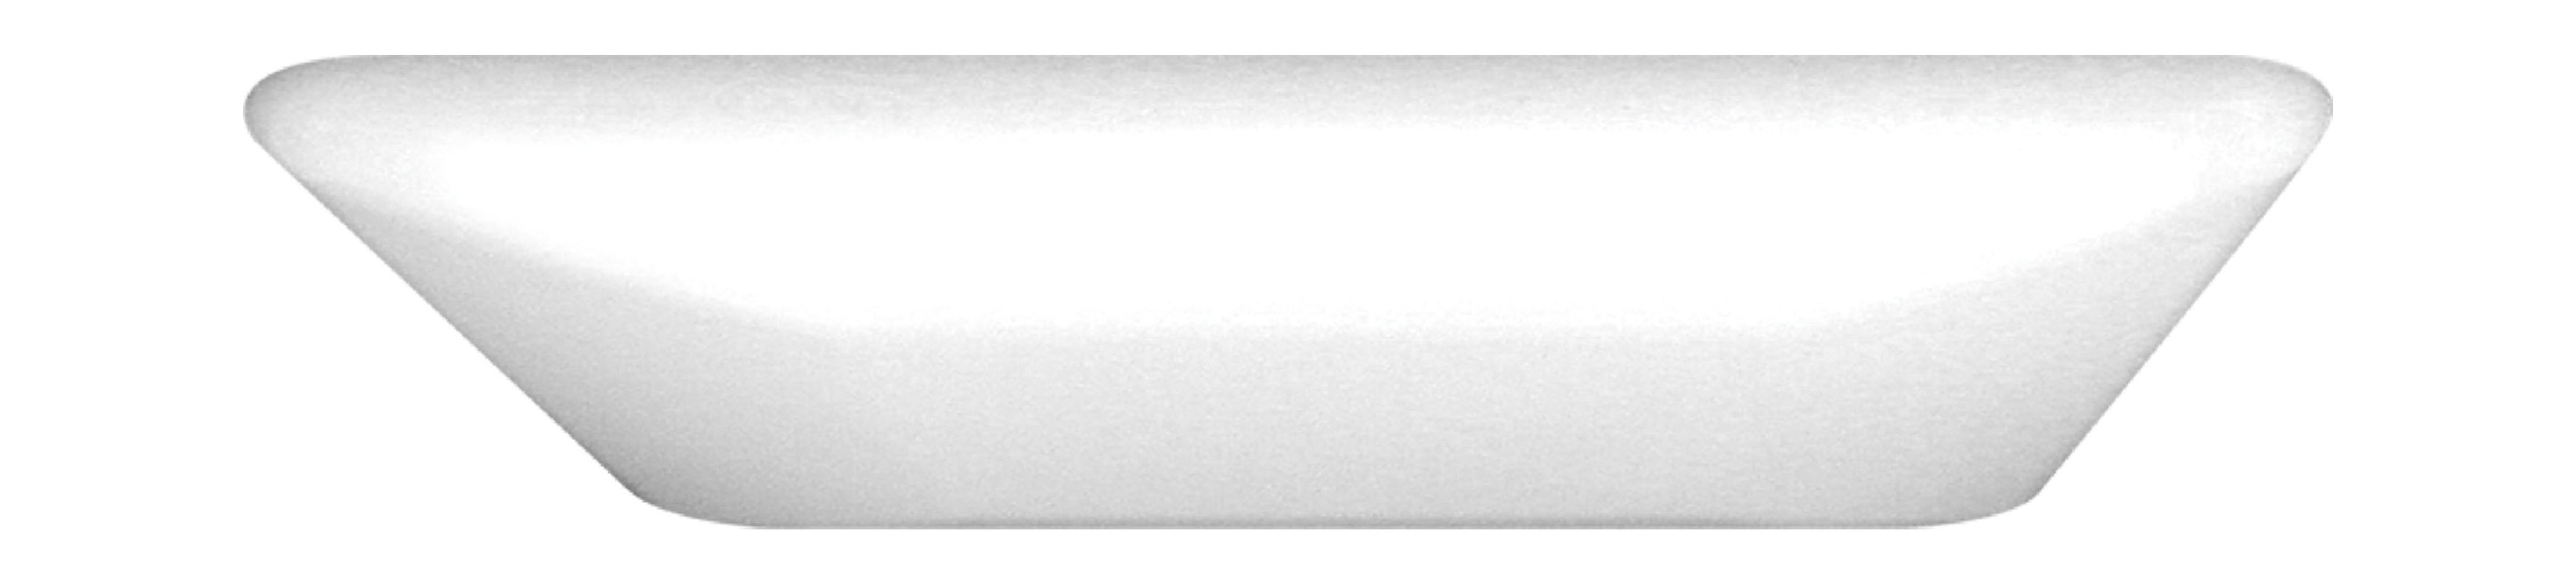 Maxim 87205 Low Profile EE 1 Light Linear Flush Mount Ceiling Fixture